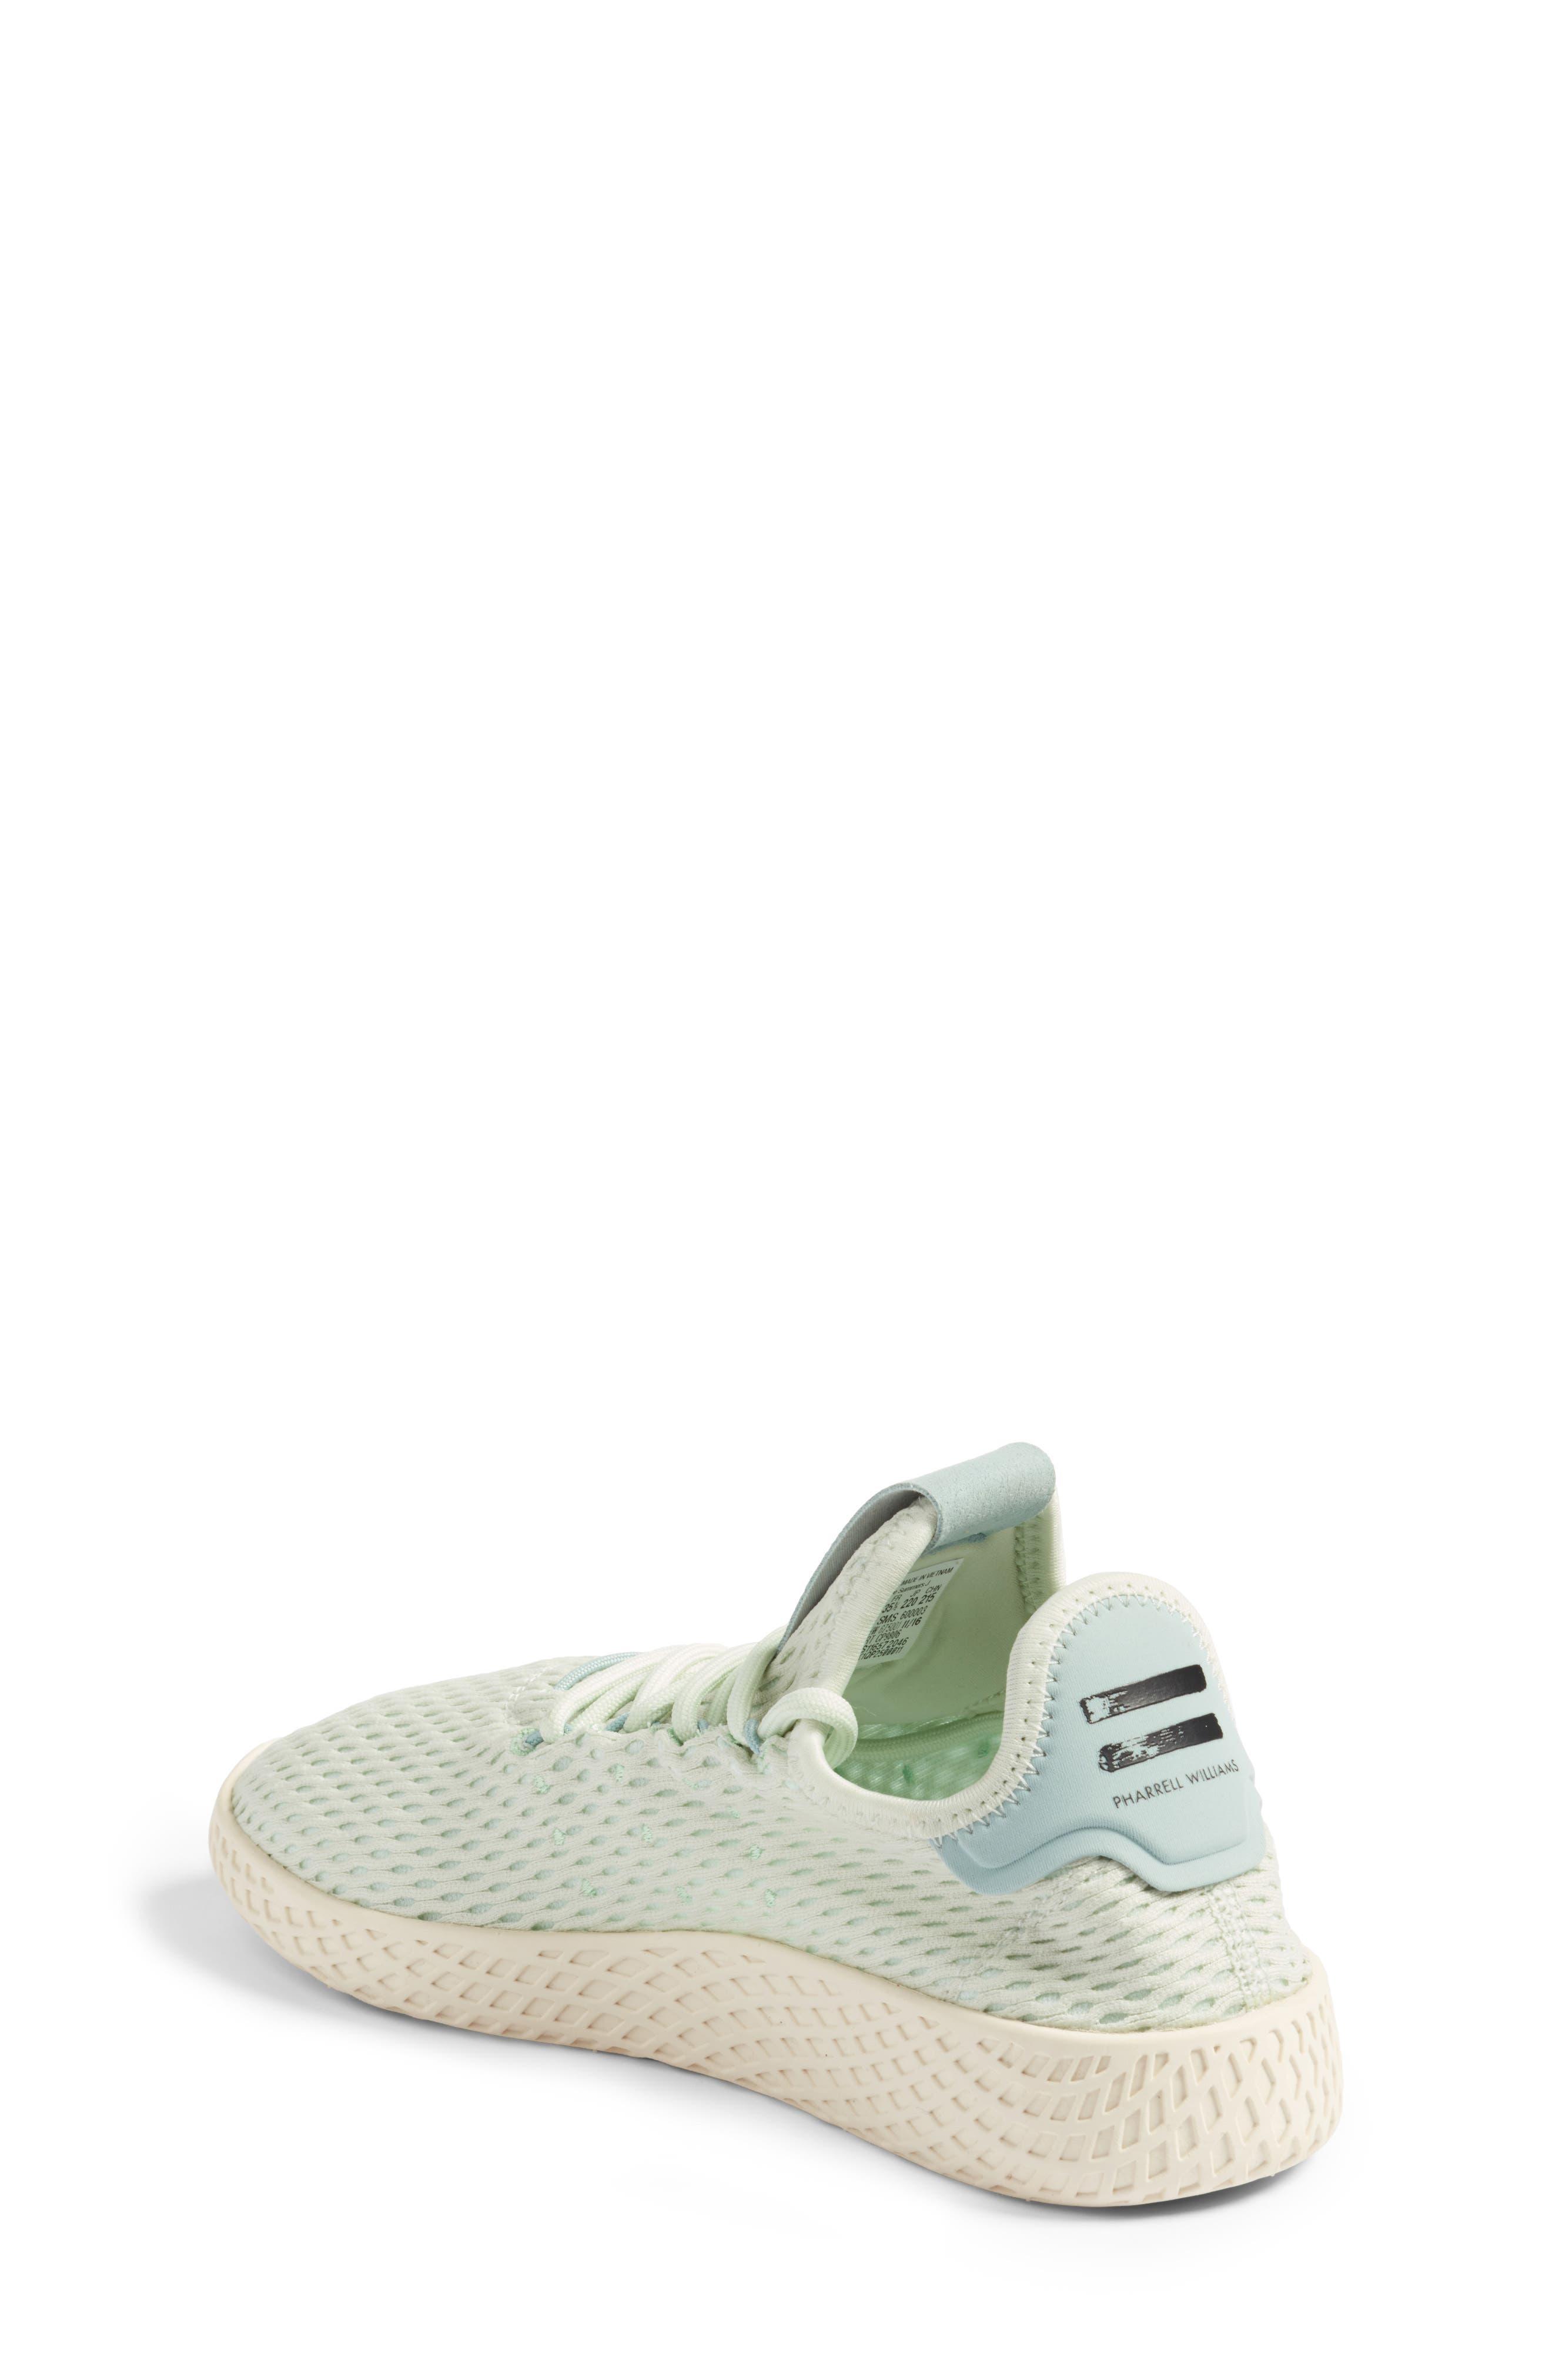 Originals x Pharrell Williams The Summers Mesh Sneaker,                             Alternate thumbnail 2, color,                             334